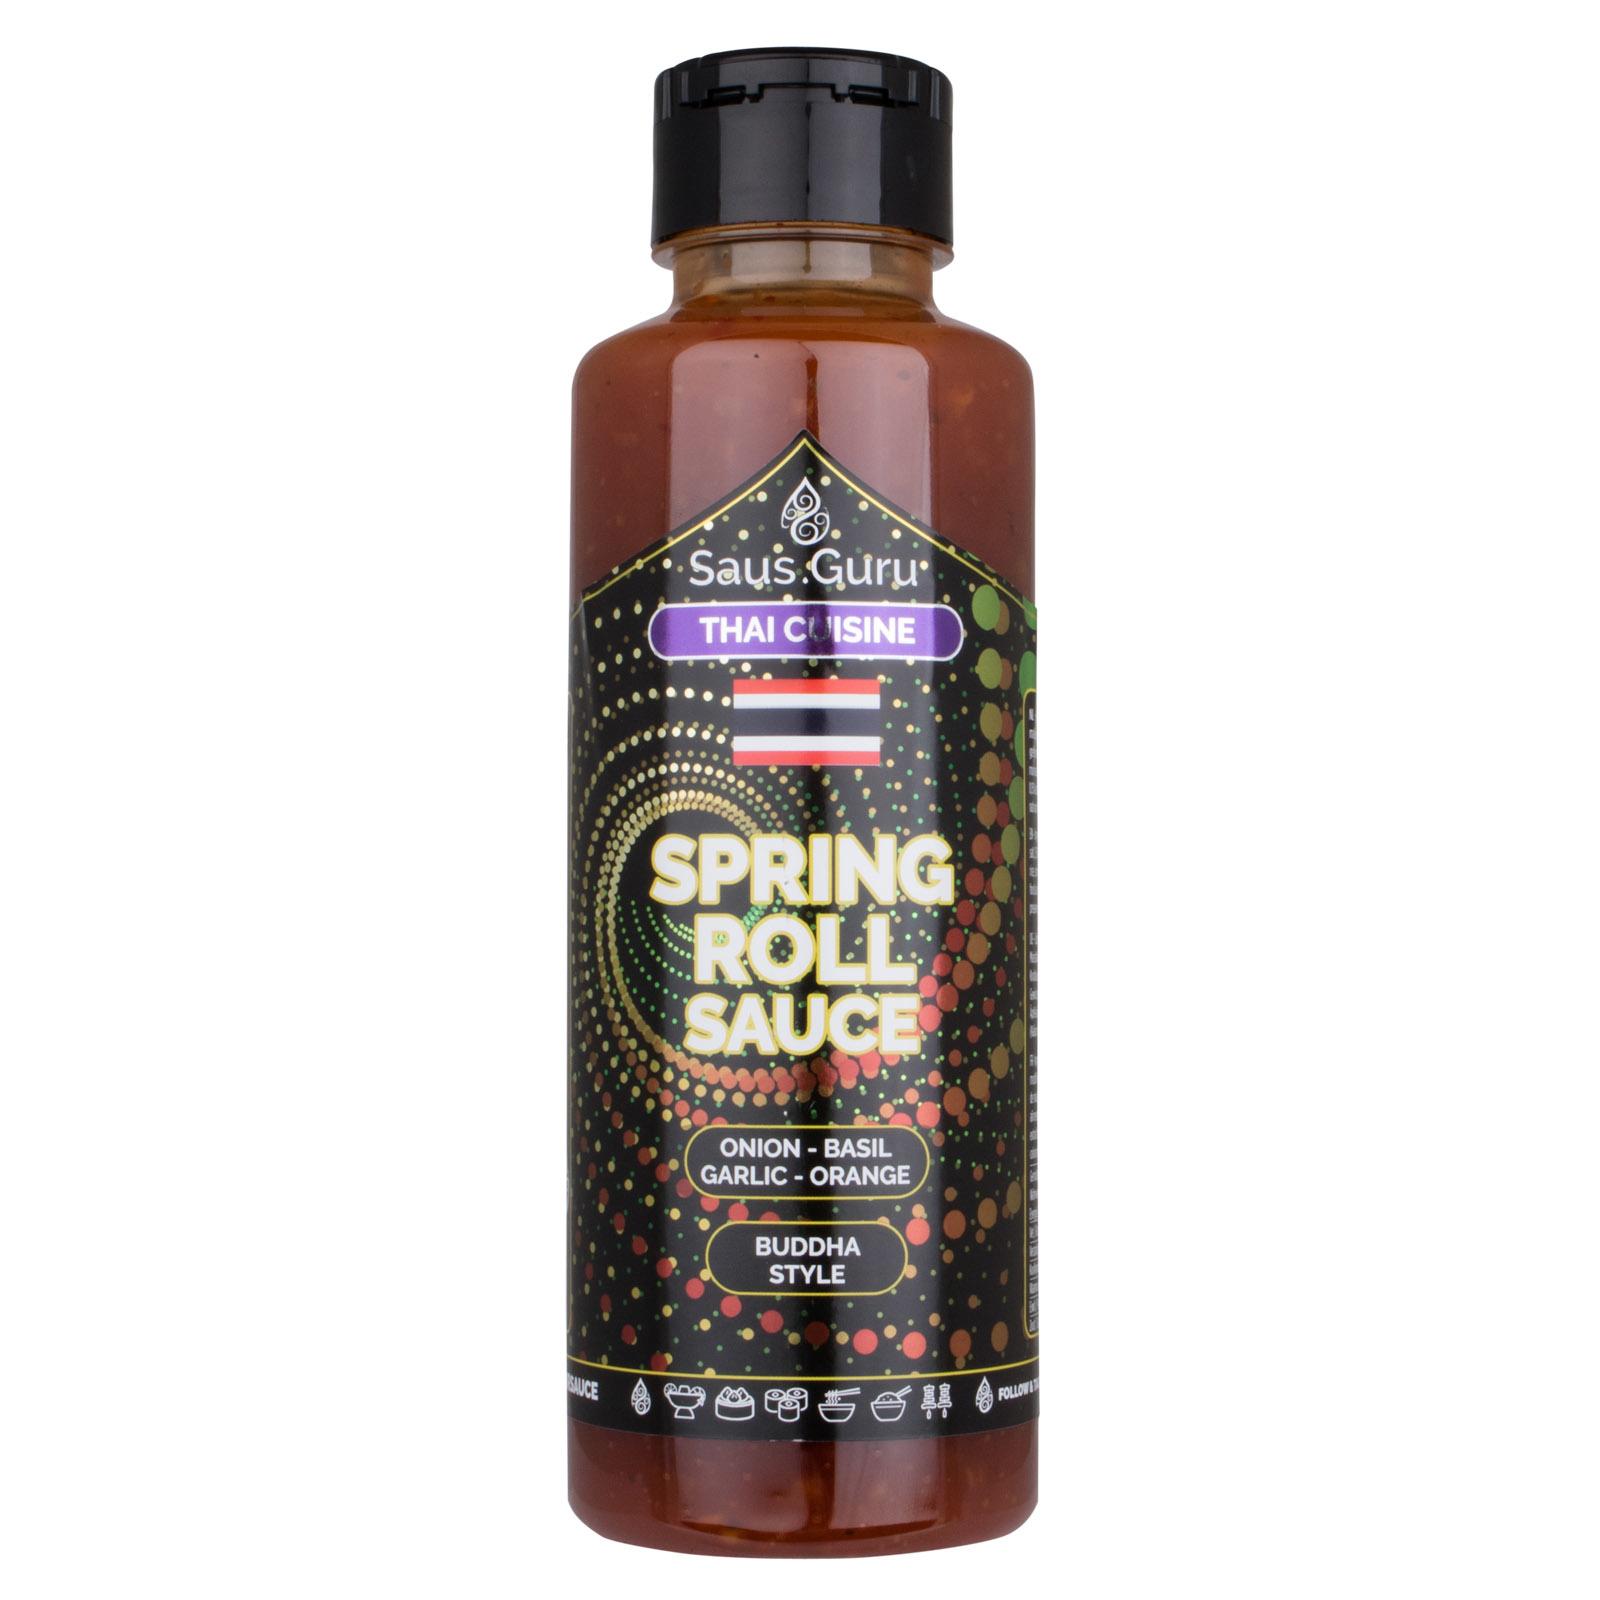 Saus.Guru's Spring Roll Sauce-2